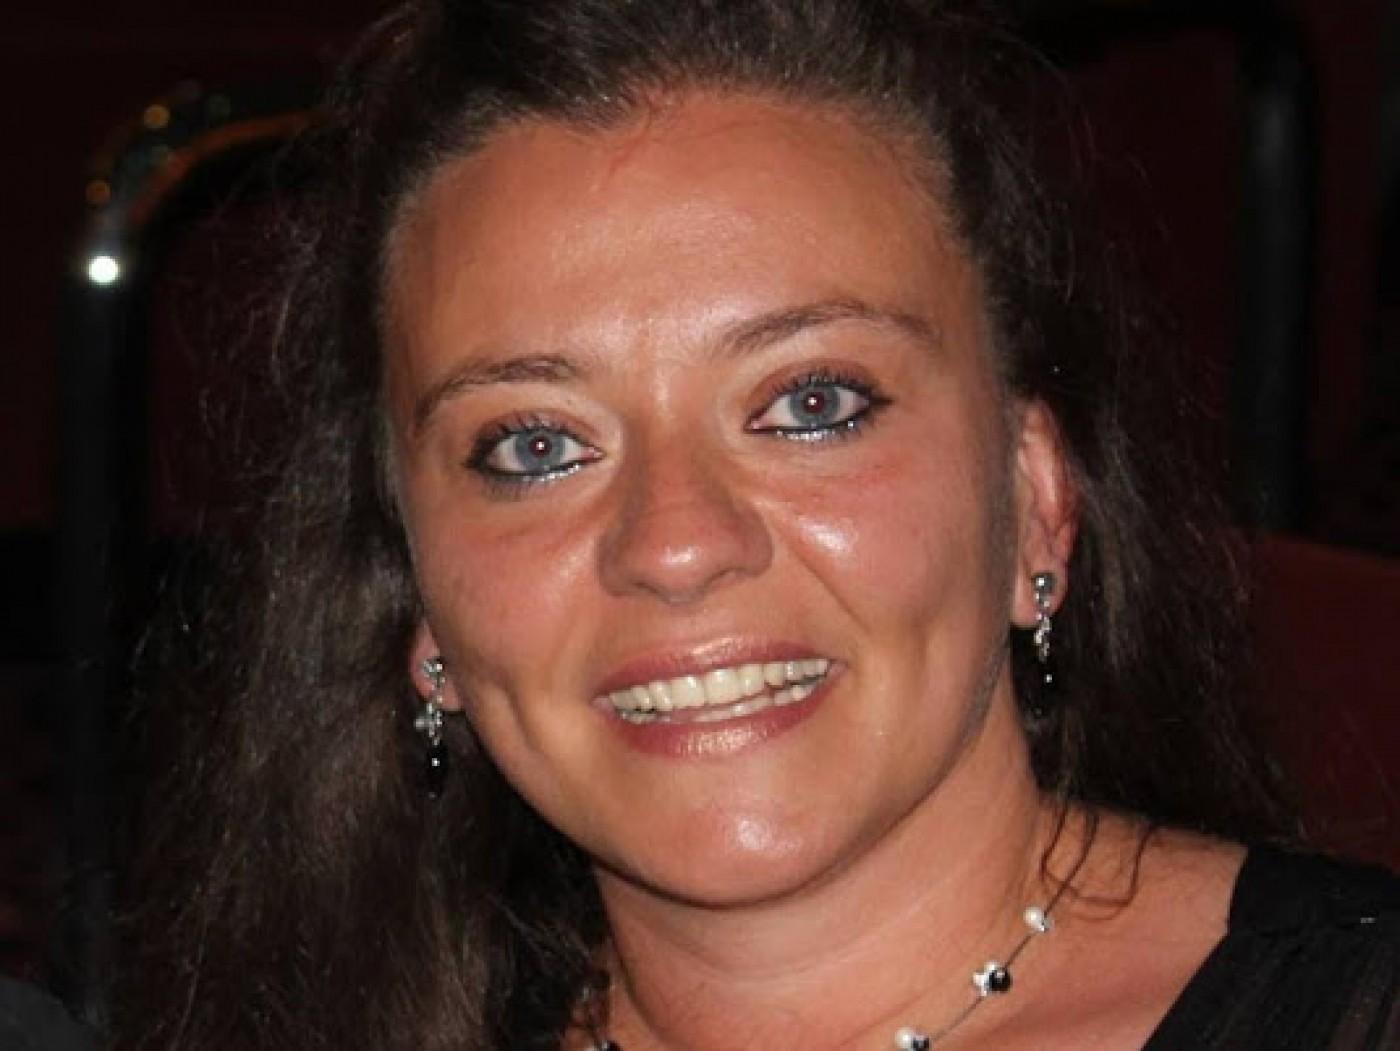 Loredana Casola, hypnotherapist, life coach and health practitioner serving Murcia and Alicante